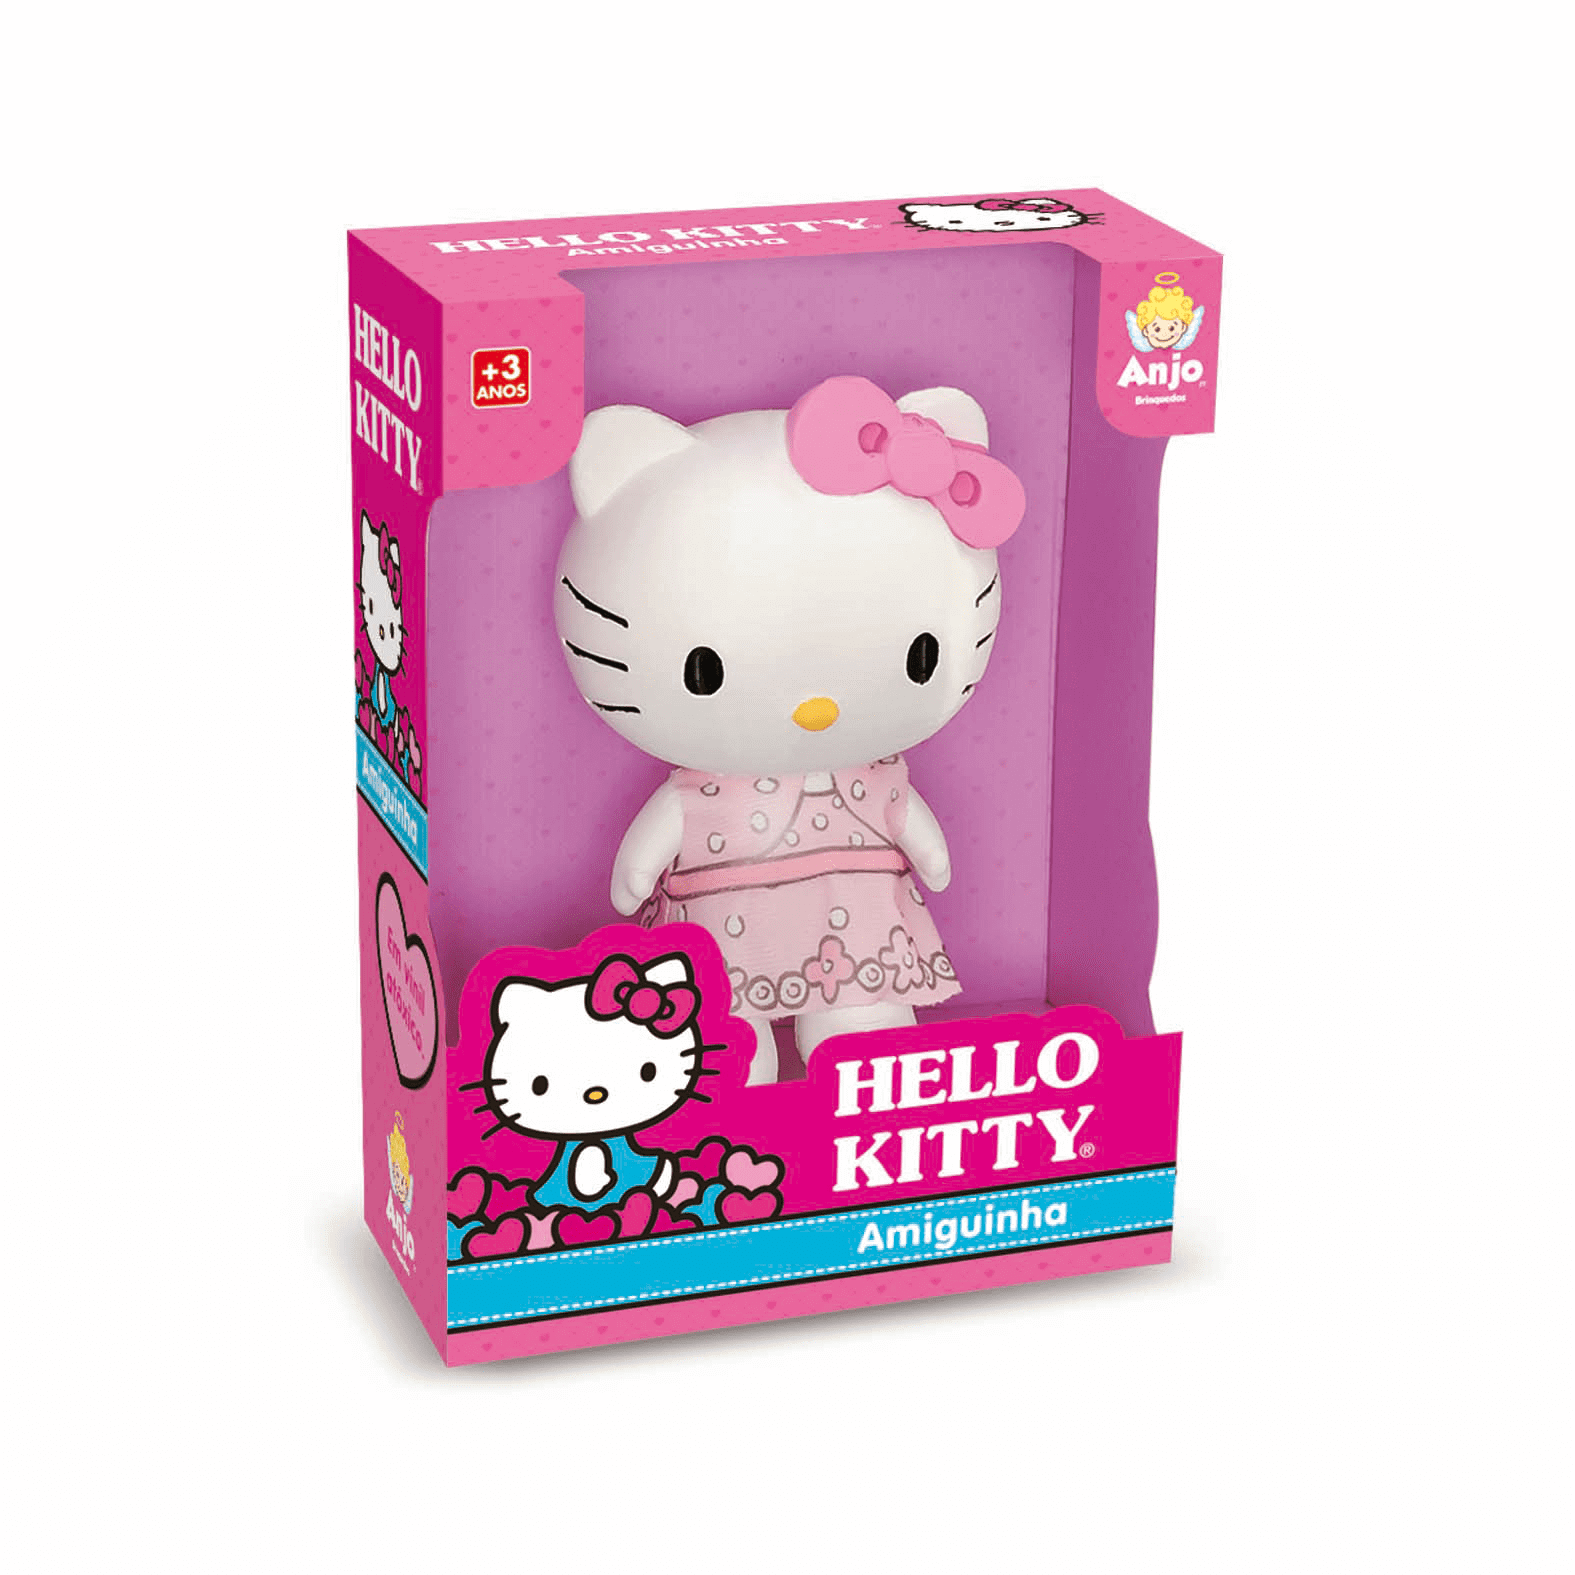 Boneca Hello Kitty Amiguinhas